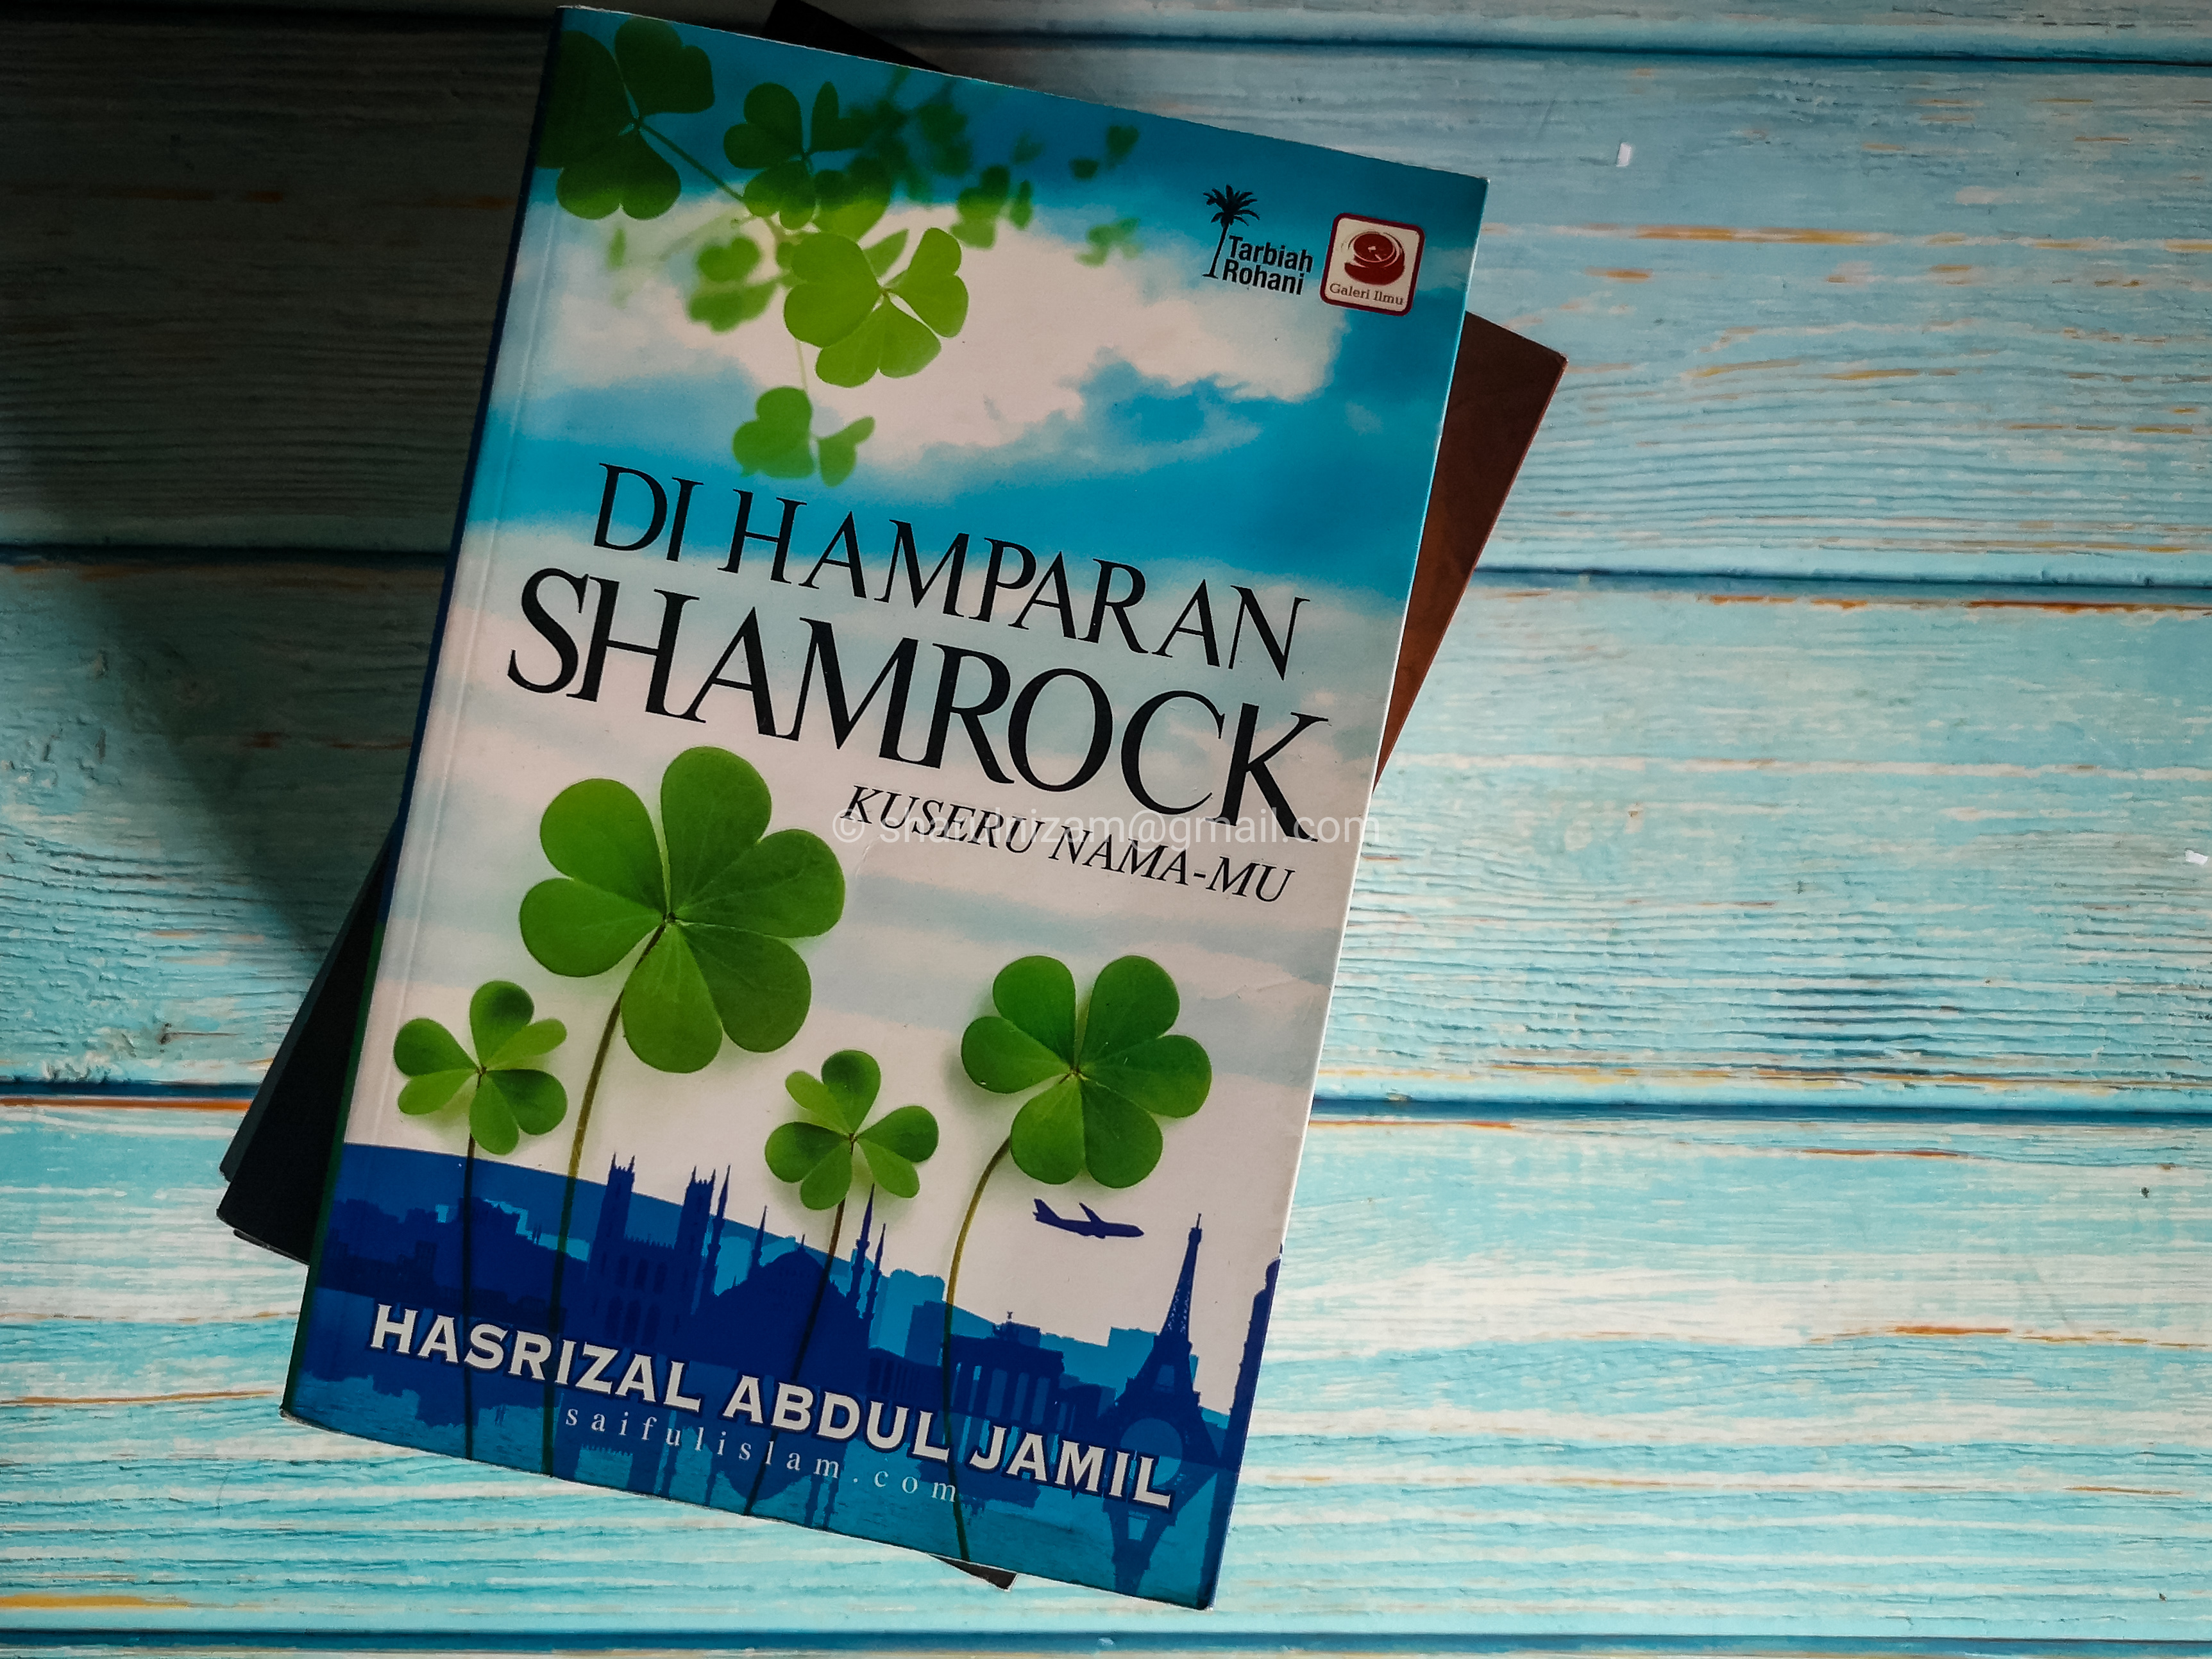 Di Hamparan Shamrock Ku Seru Nama-Mu  Oleh Ustaz Hasrizal Abdul Jamil